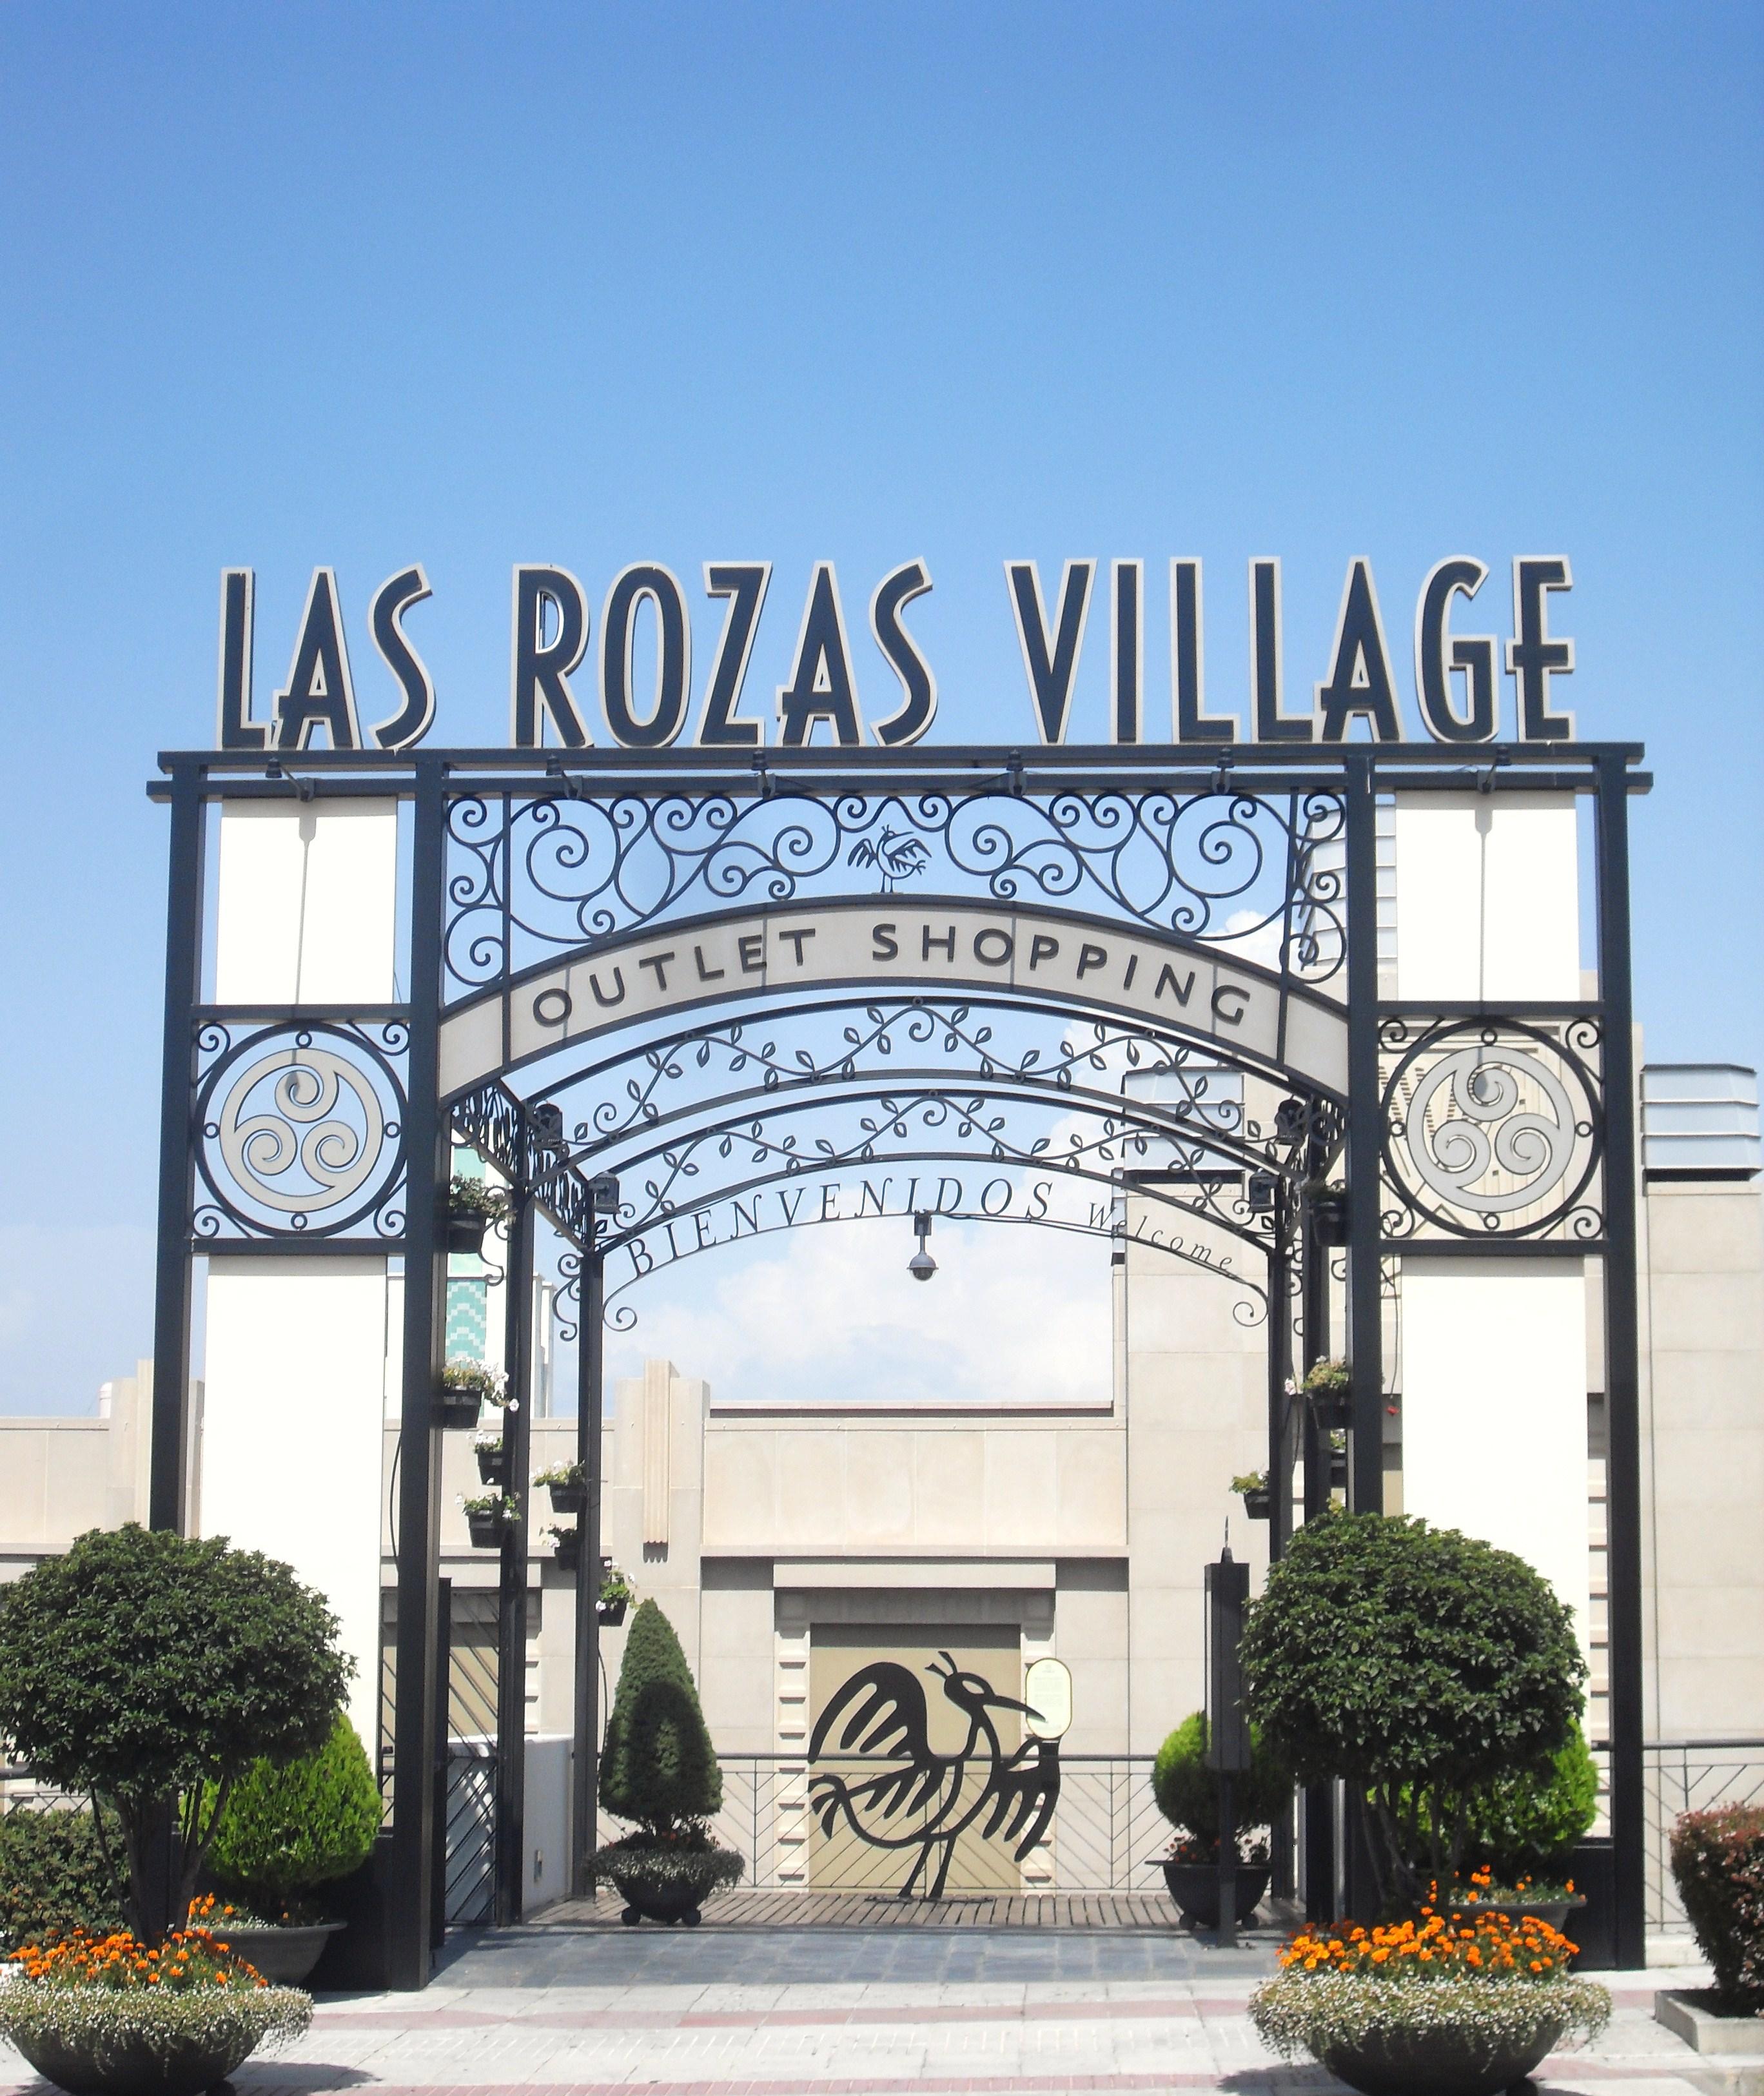 Las Rozas Fabulous Las Rozas With Las Rozas Excellent Private  # Muebles Las Rozas Village